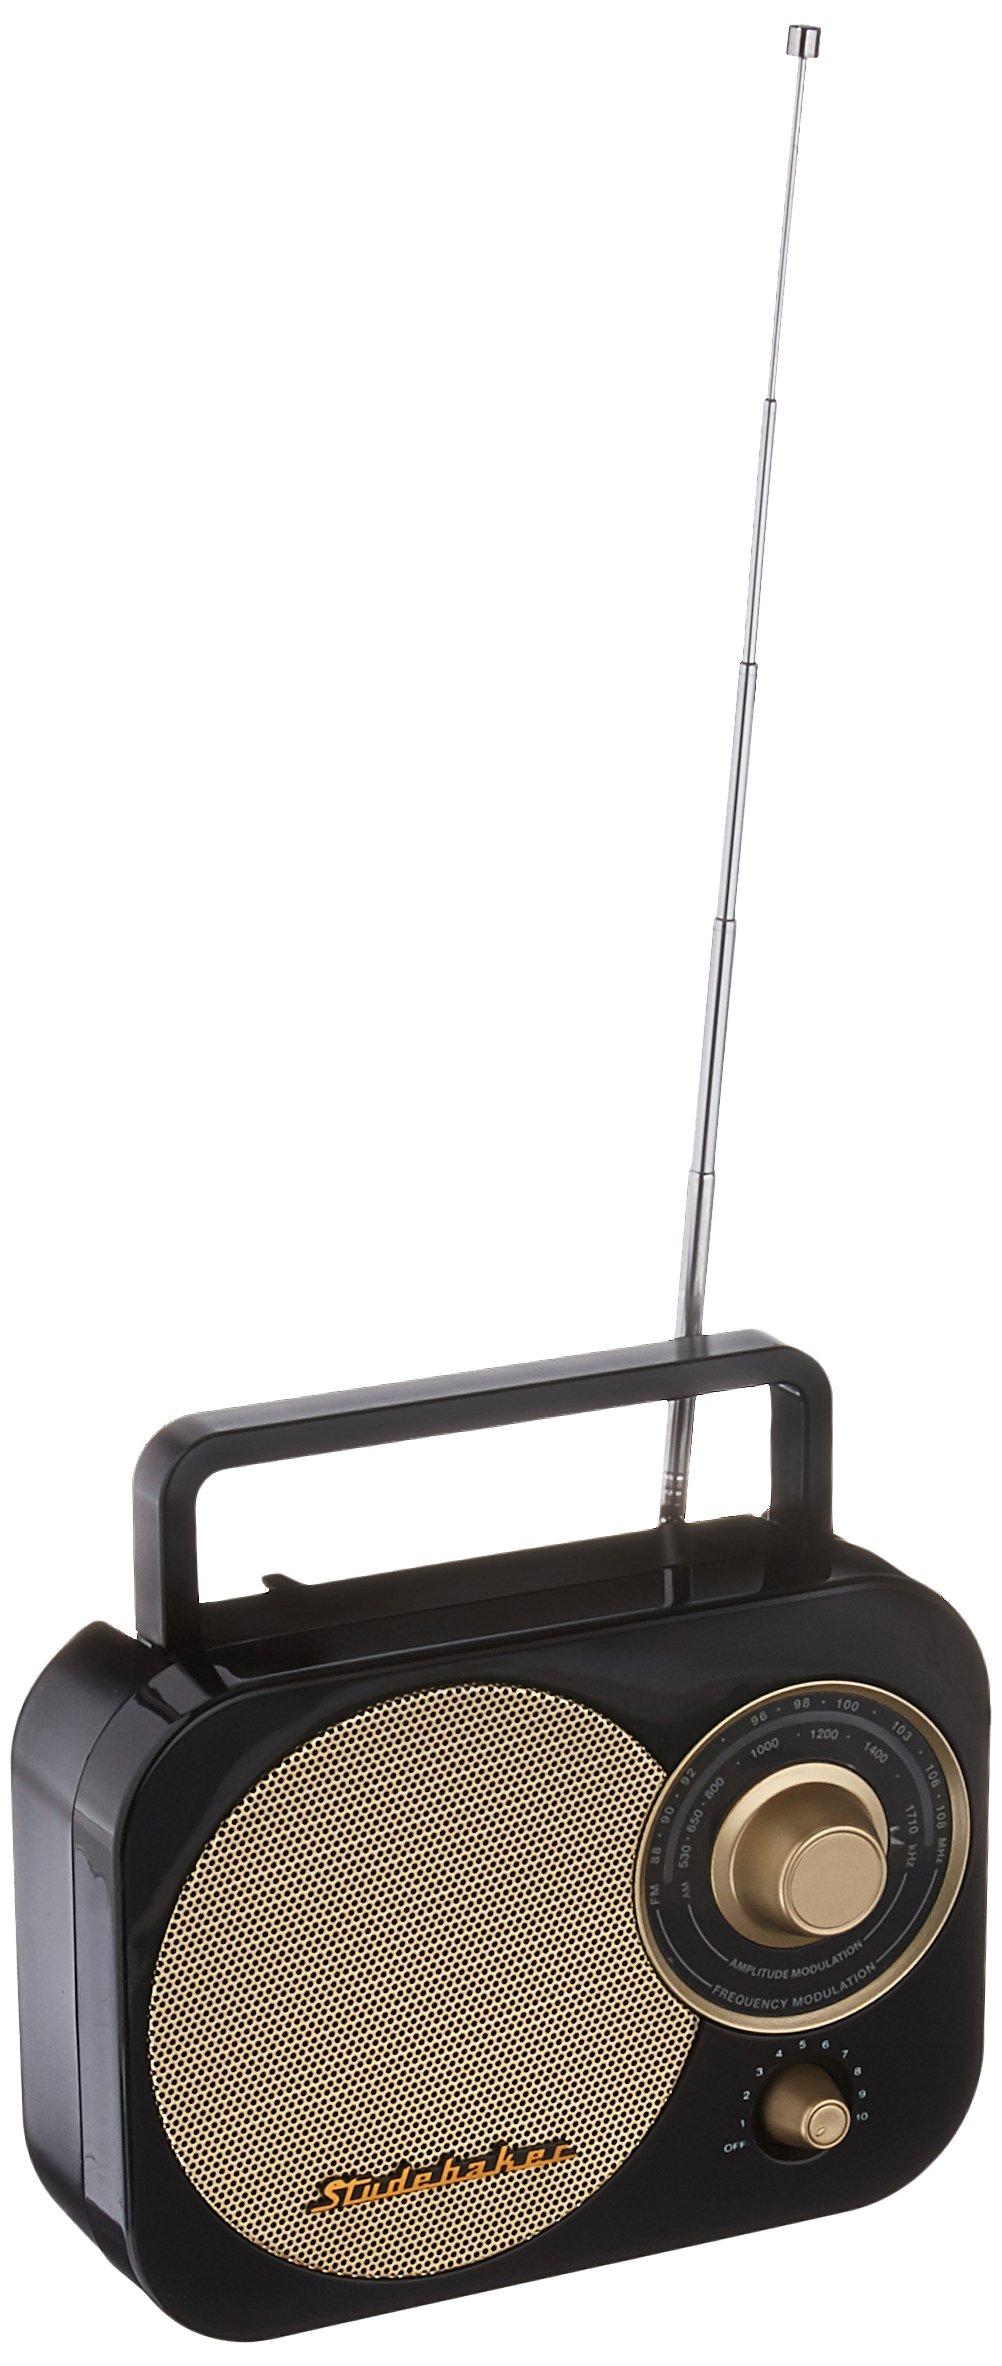 Studebaker 4330975871 Black Retro  SB2000 Replica Portable AM/FM Radio with Aux Input